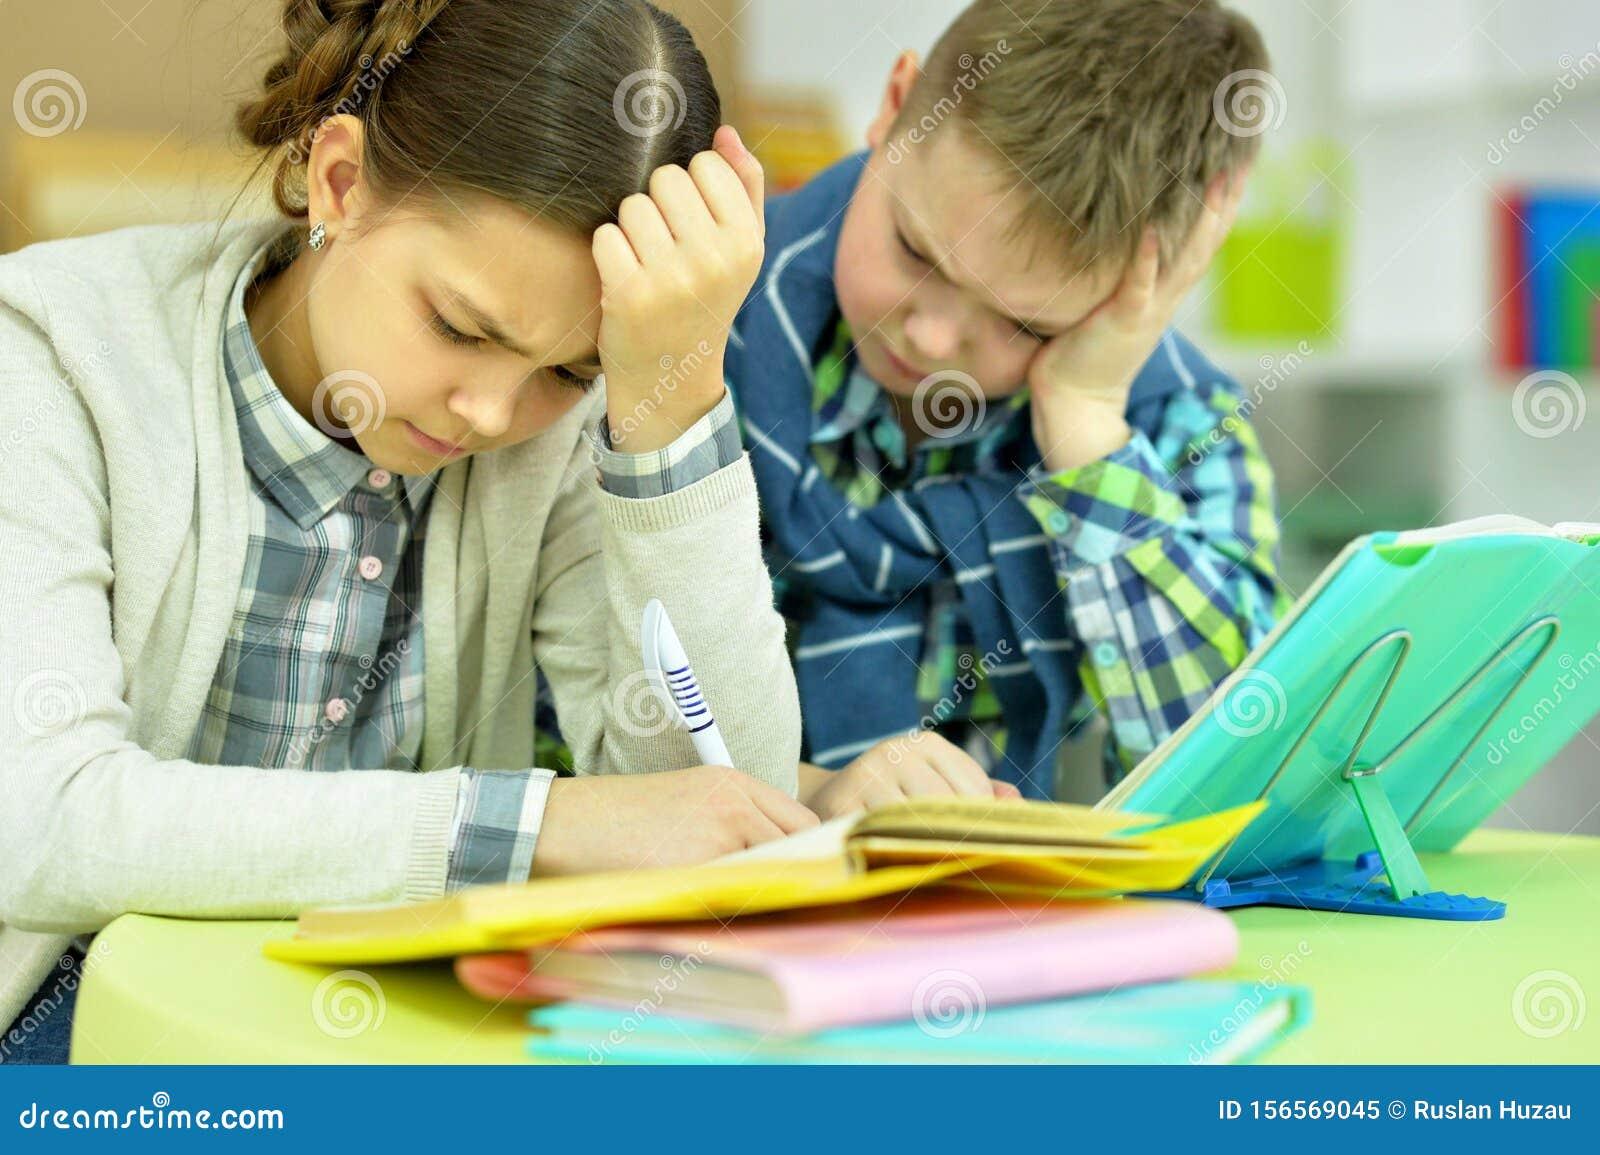 essays owen meany